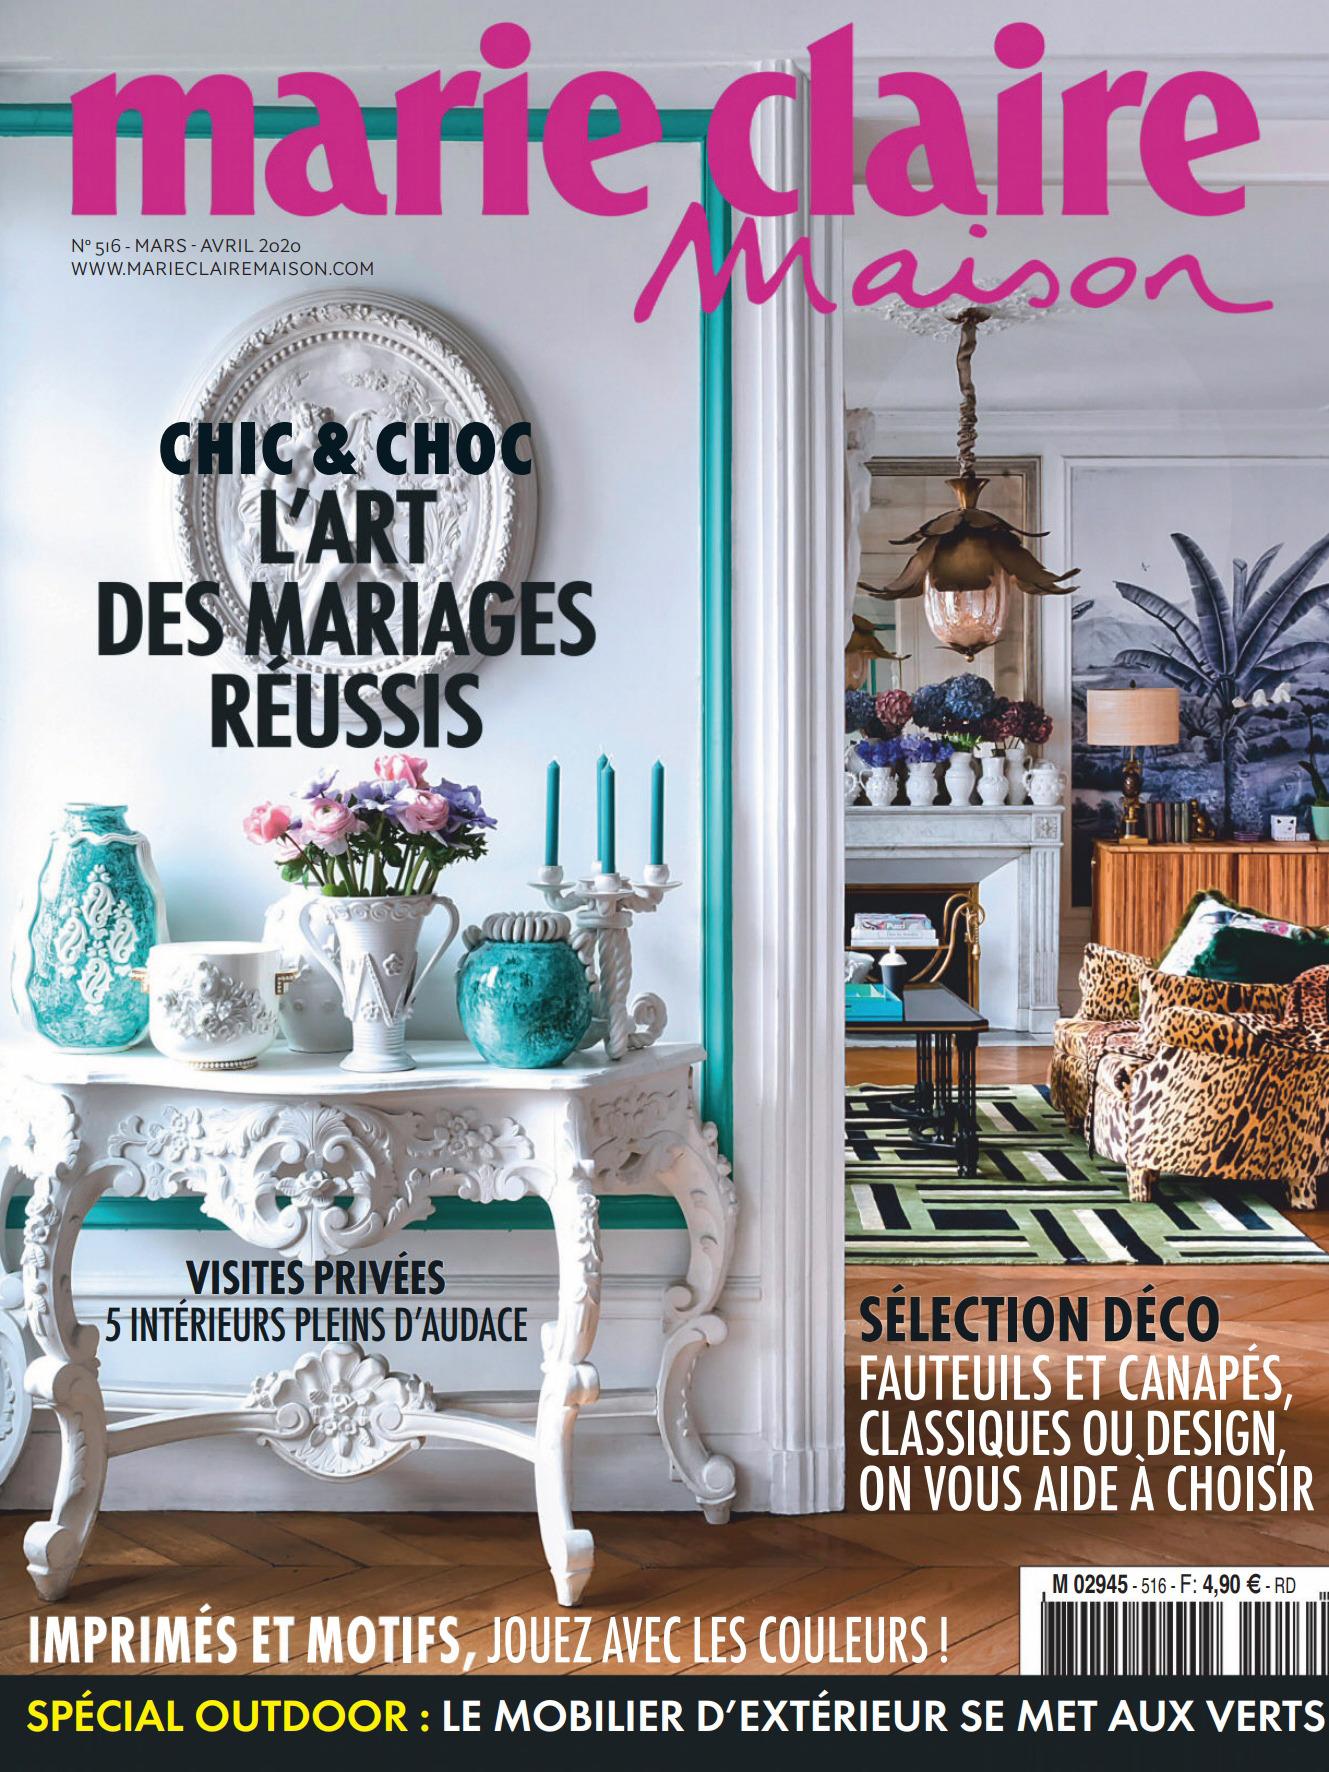 《Marie Claire maison》法国版时尚室内设计杂志2020年03-04月号